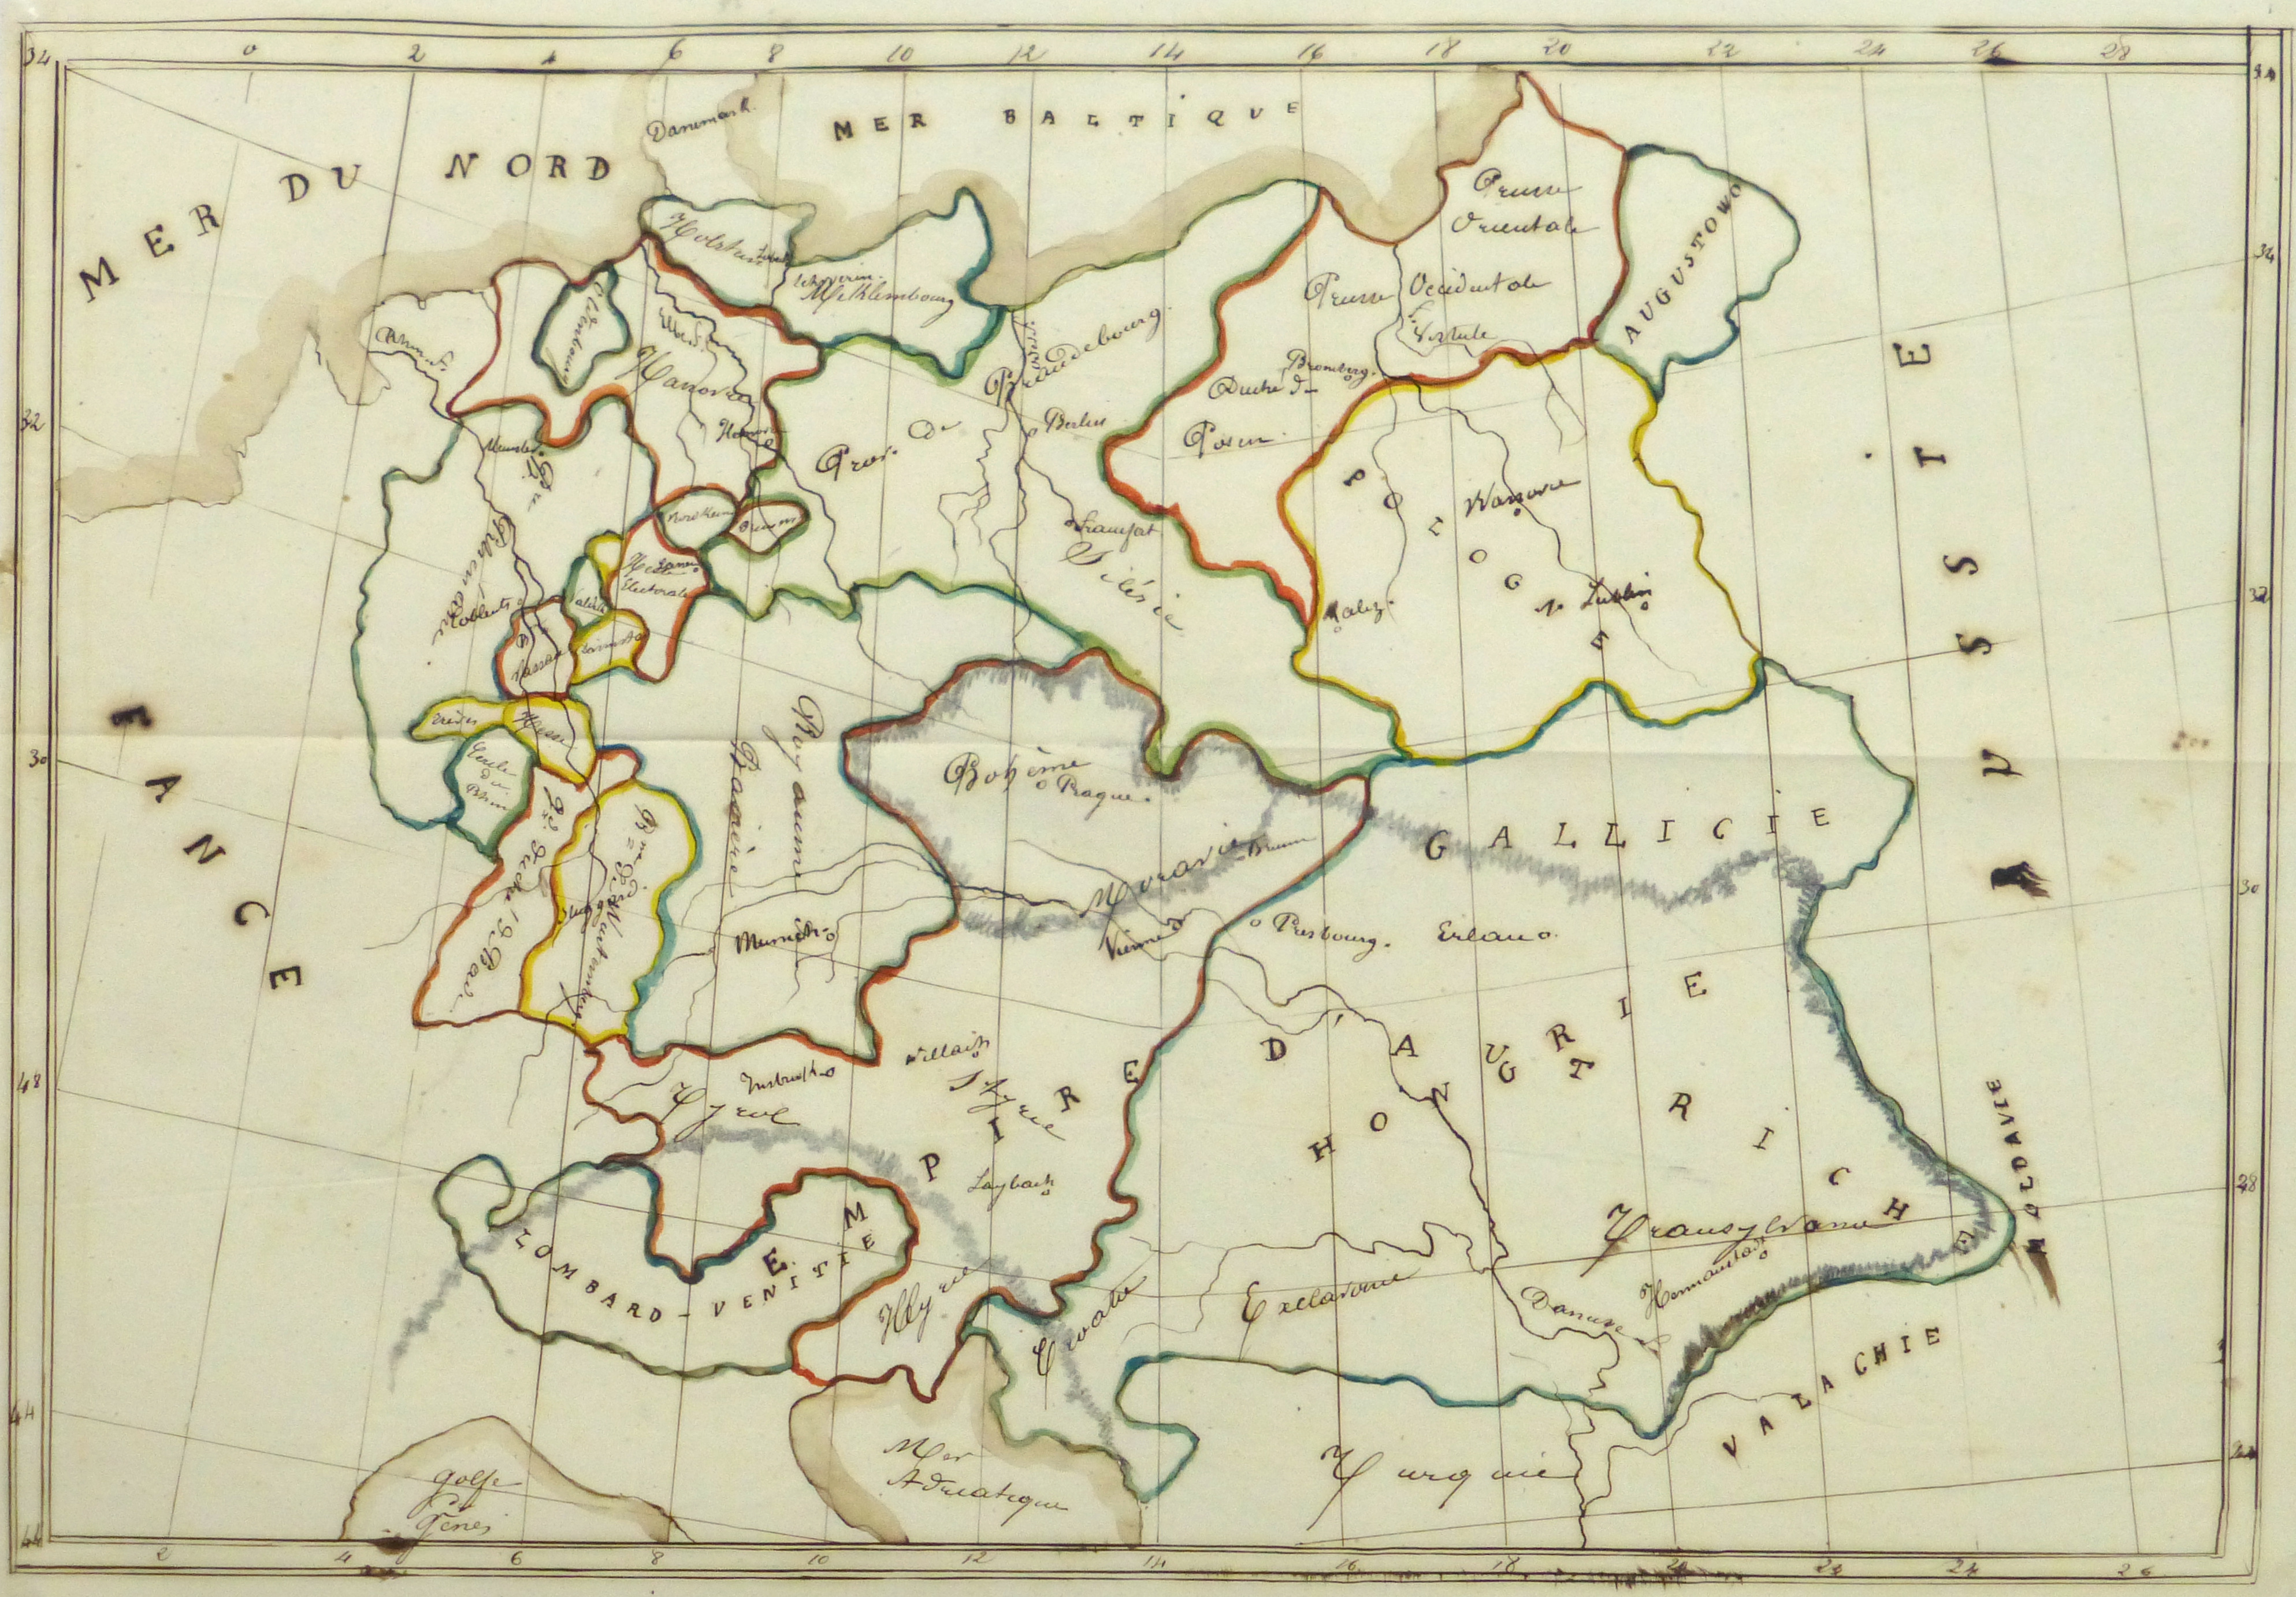 Map of Central Europe, 1856 - Original Art, Antique Maps & Prints